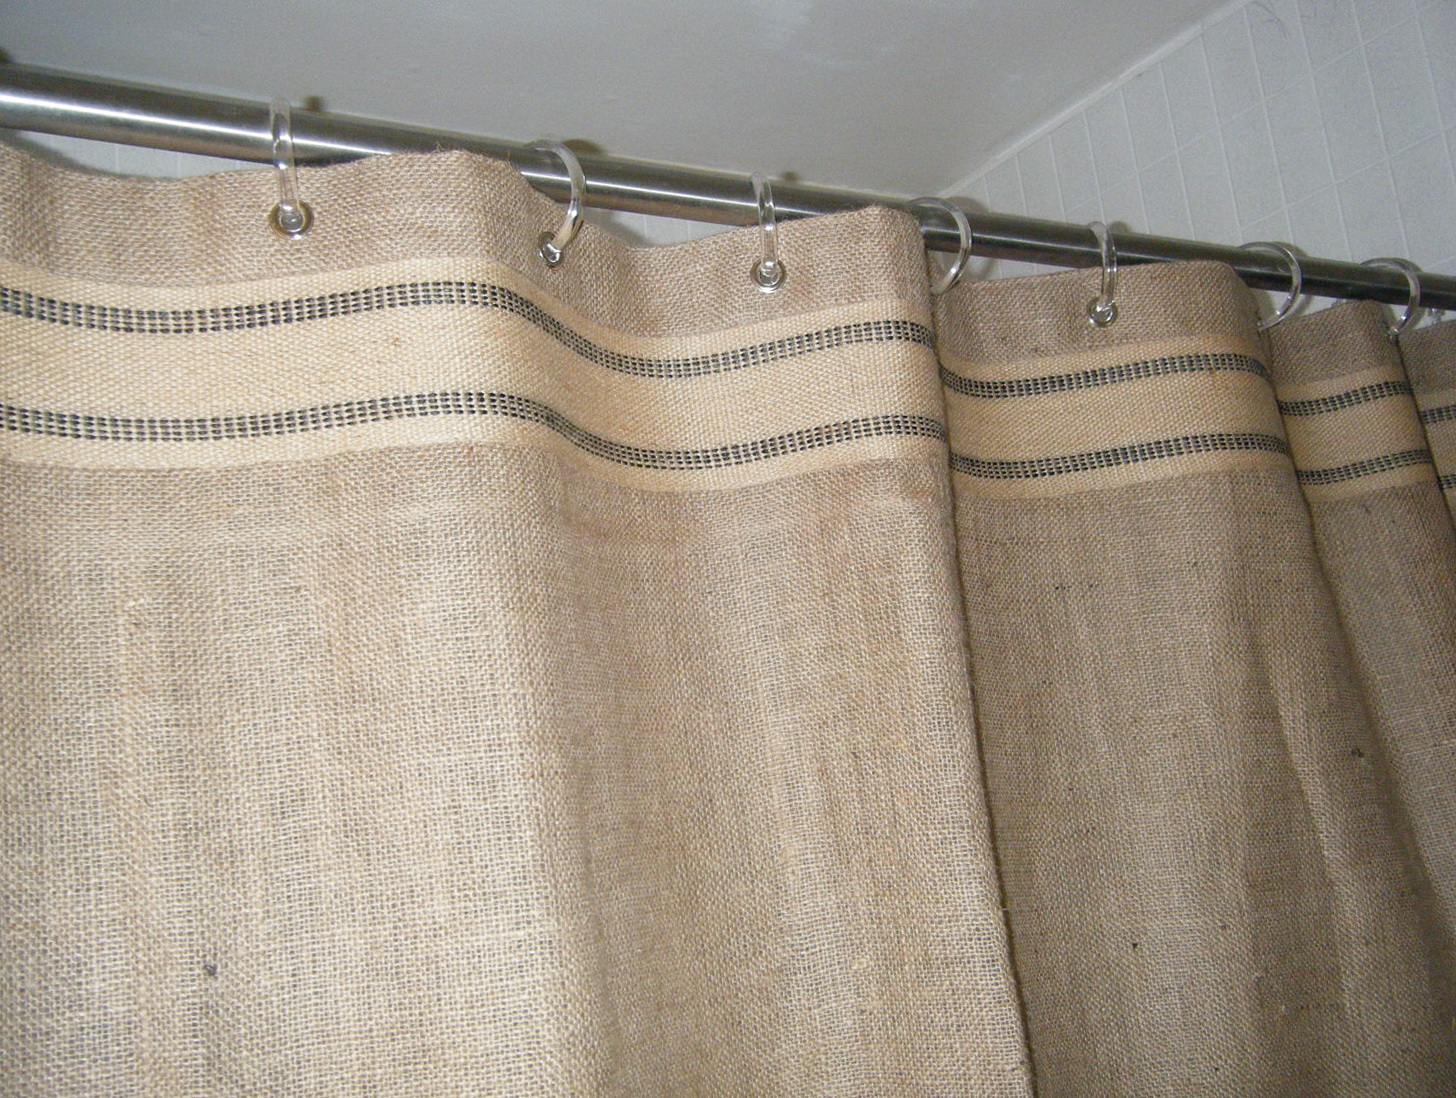 interdesign green amazon aquamarine x moxi dining curtains curtain shower kitchen dp blue com fabric